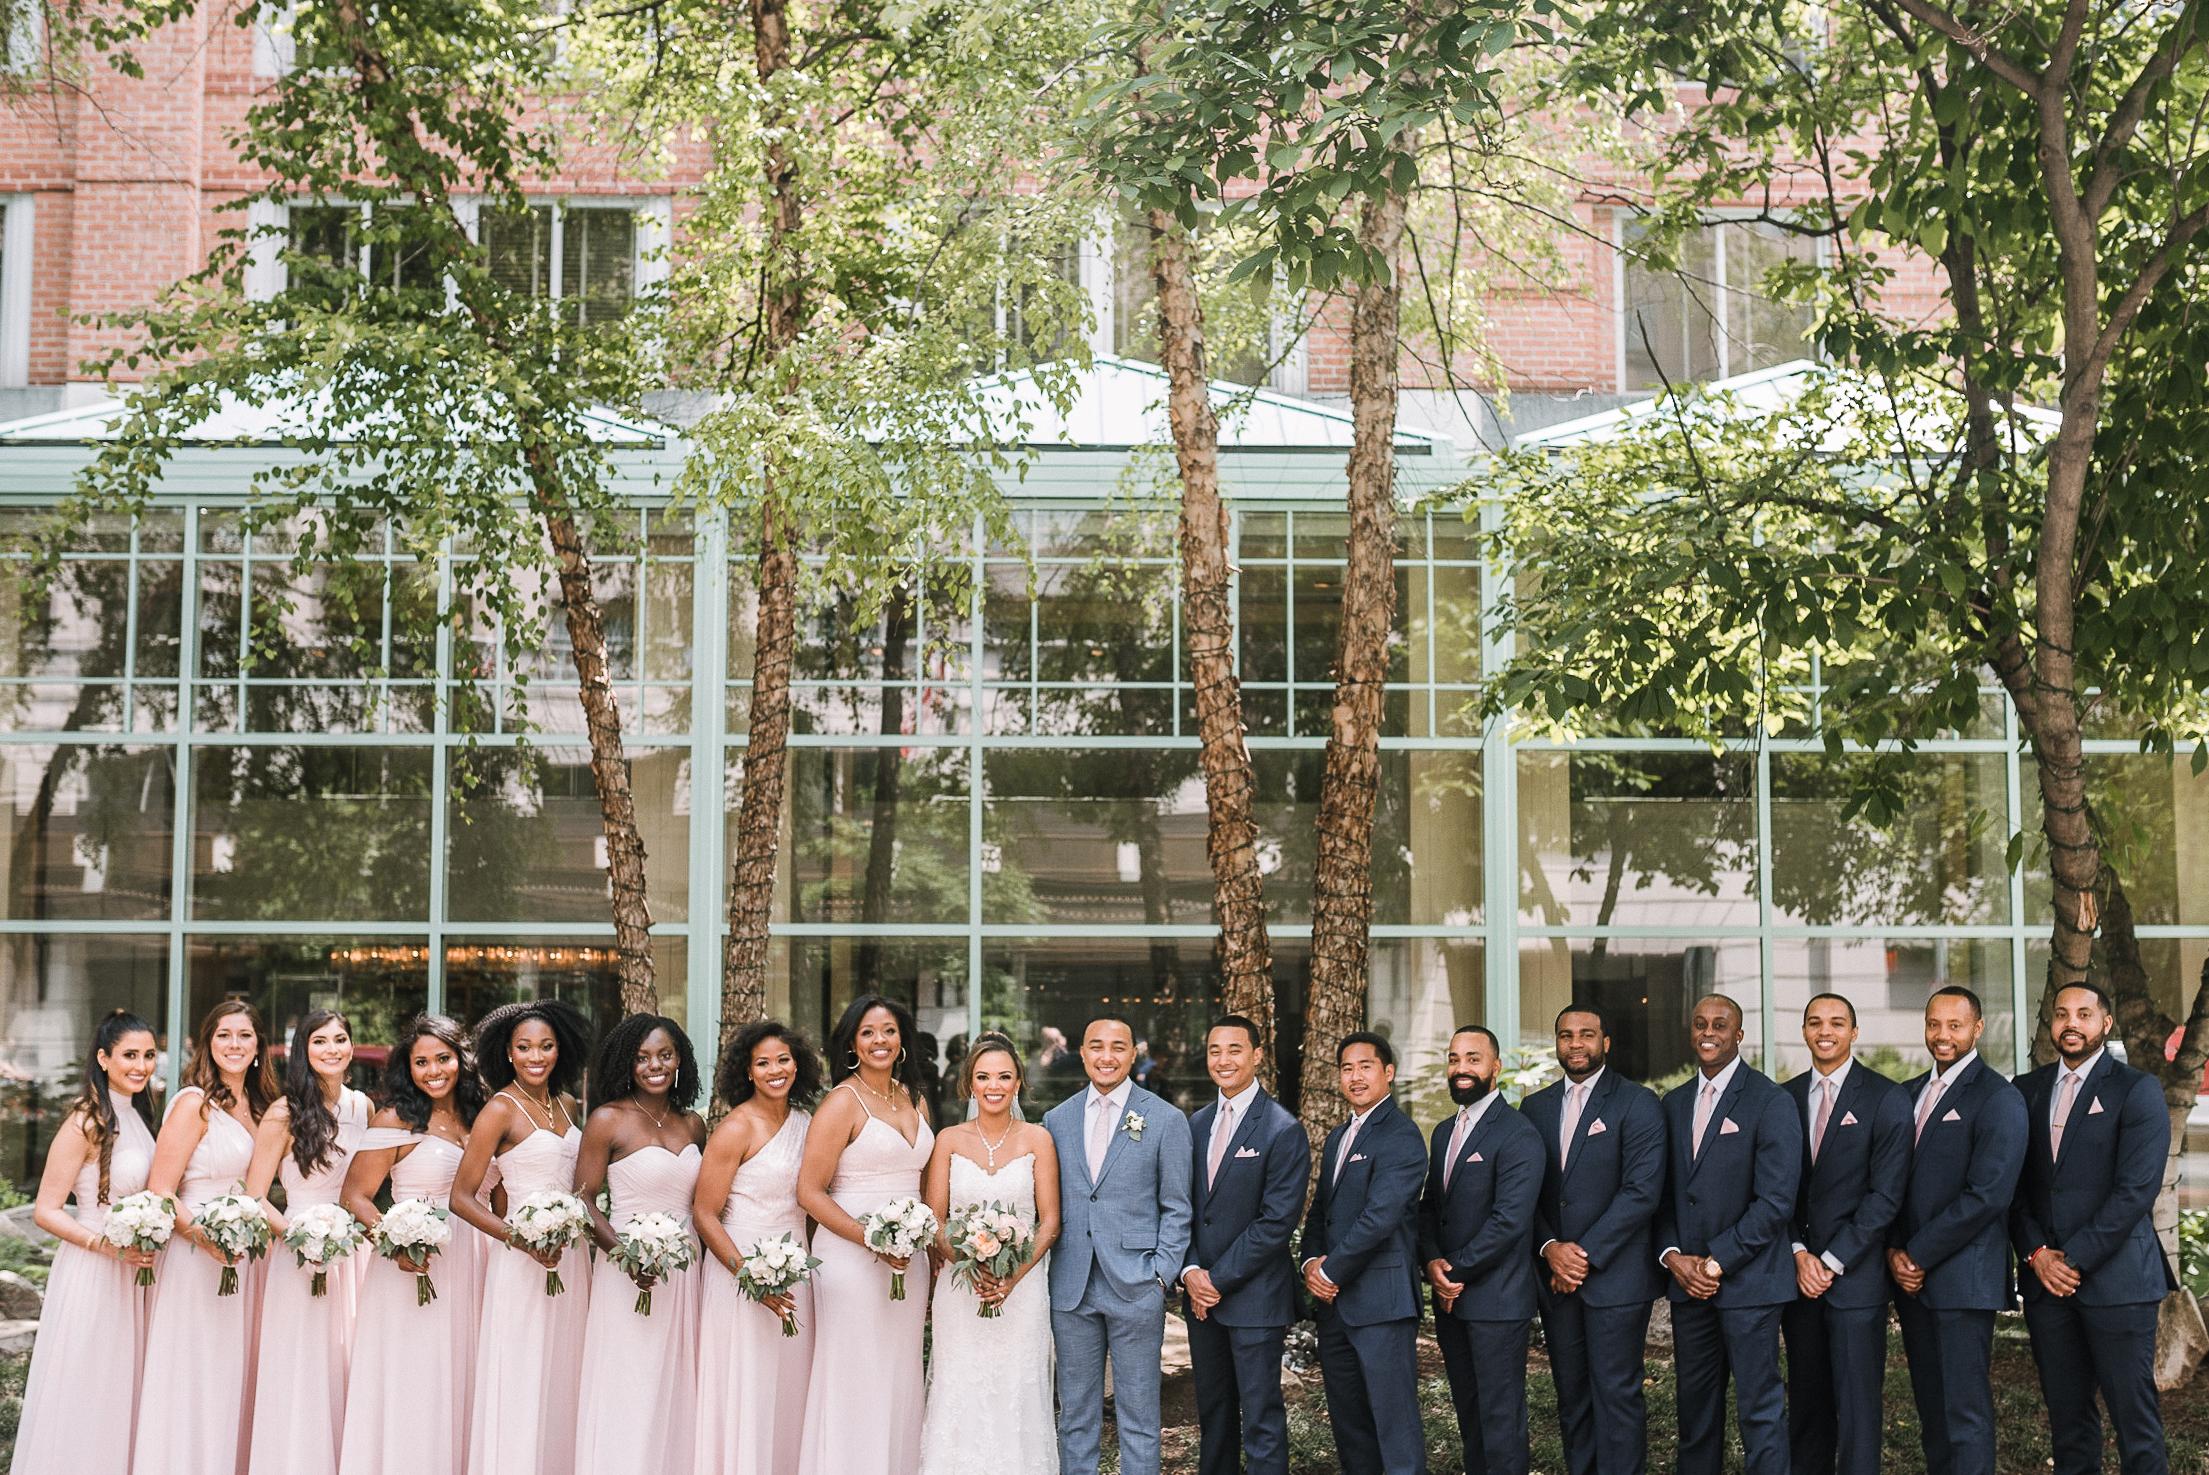 wedding party smiling at The Park Hyatt Hotel in Washington DC